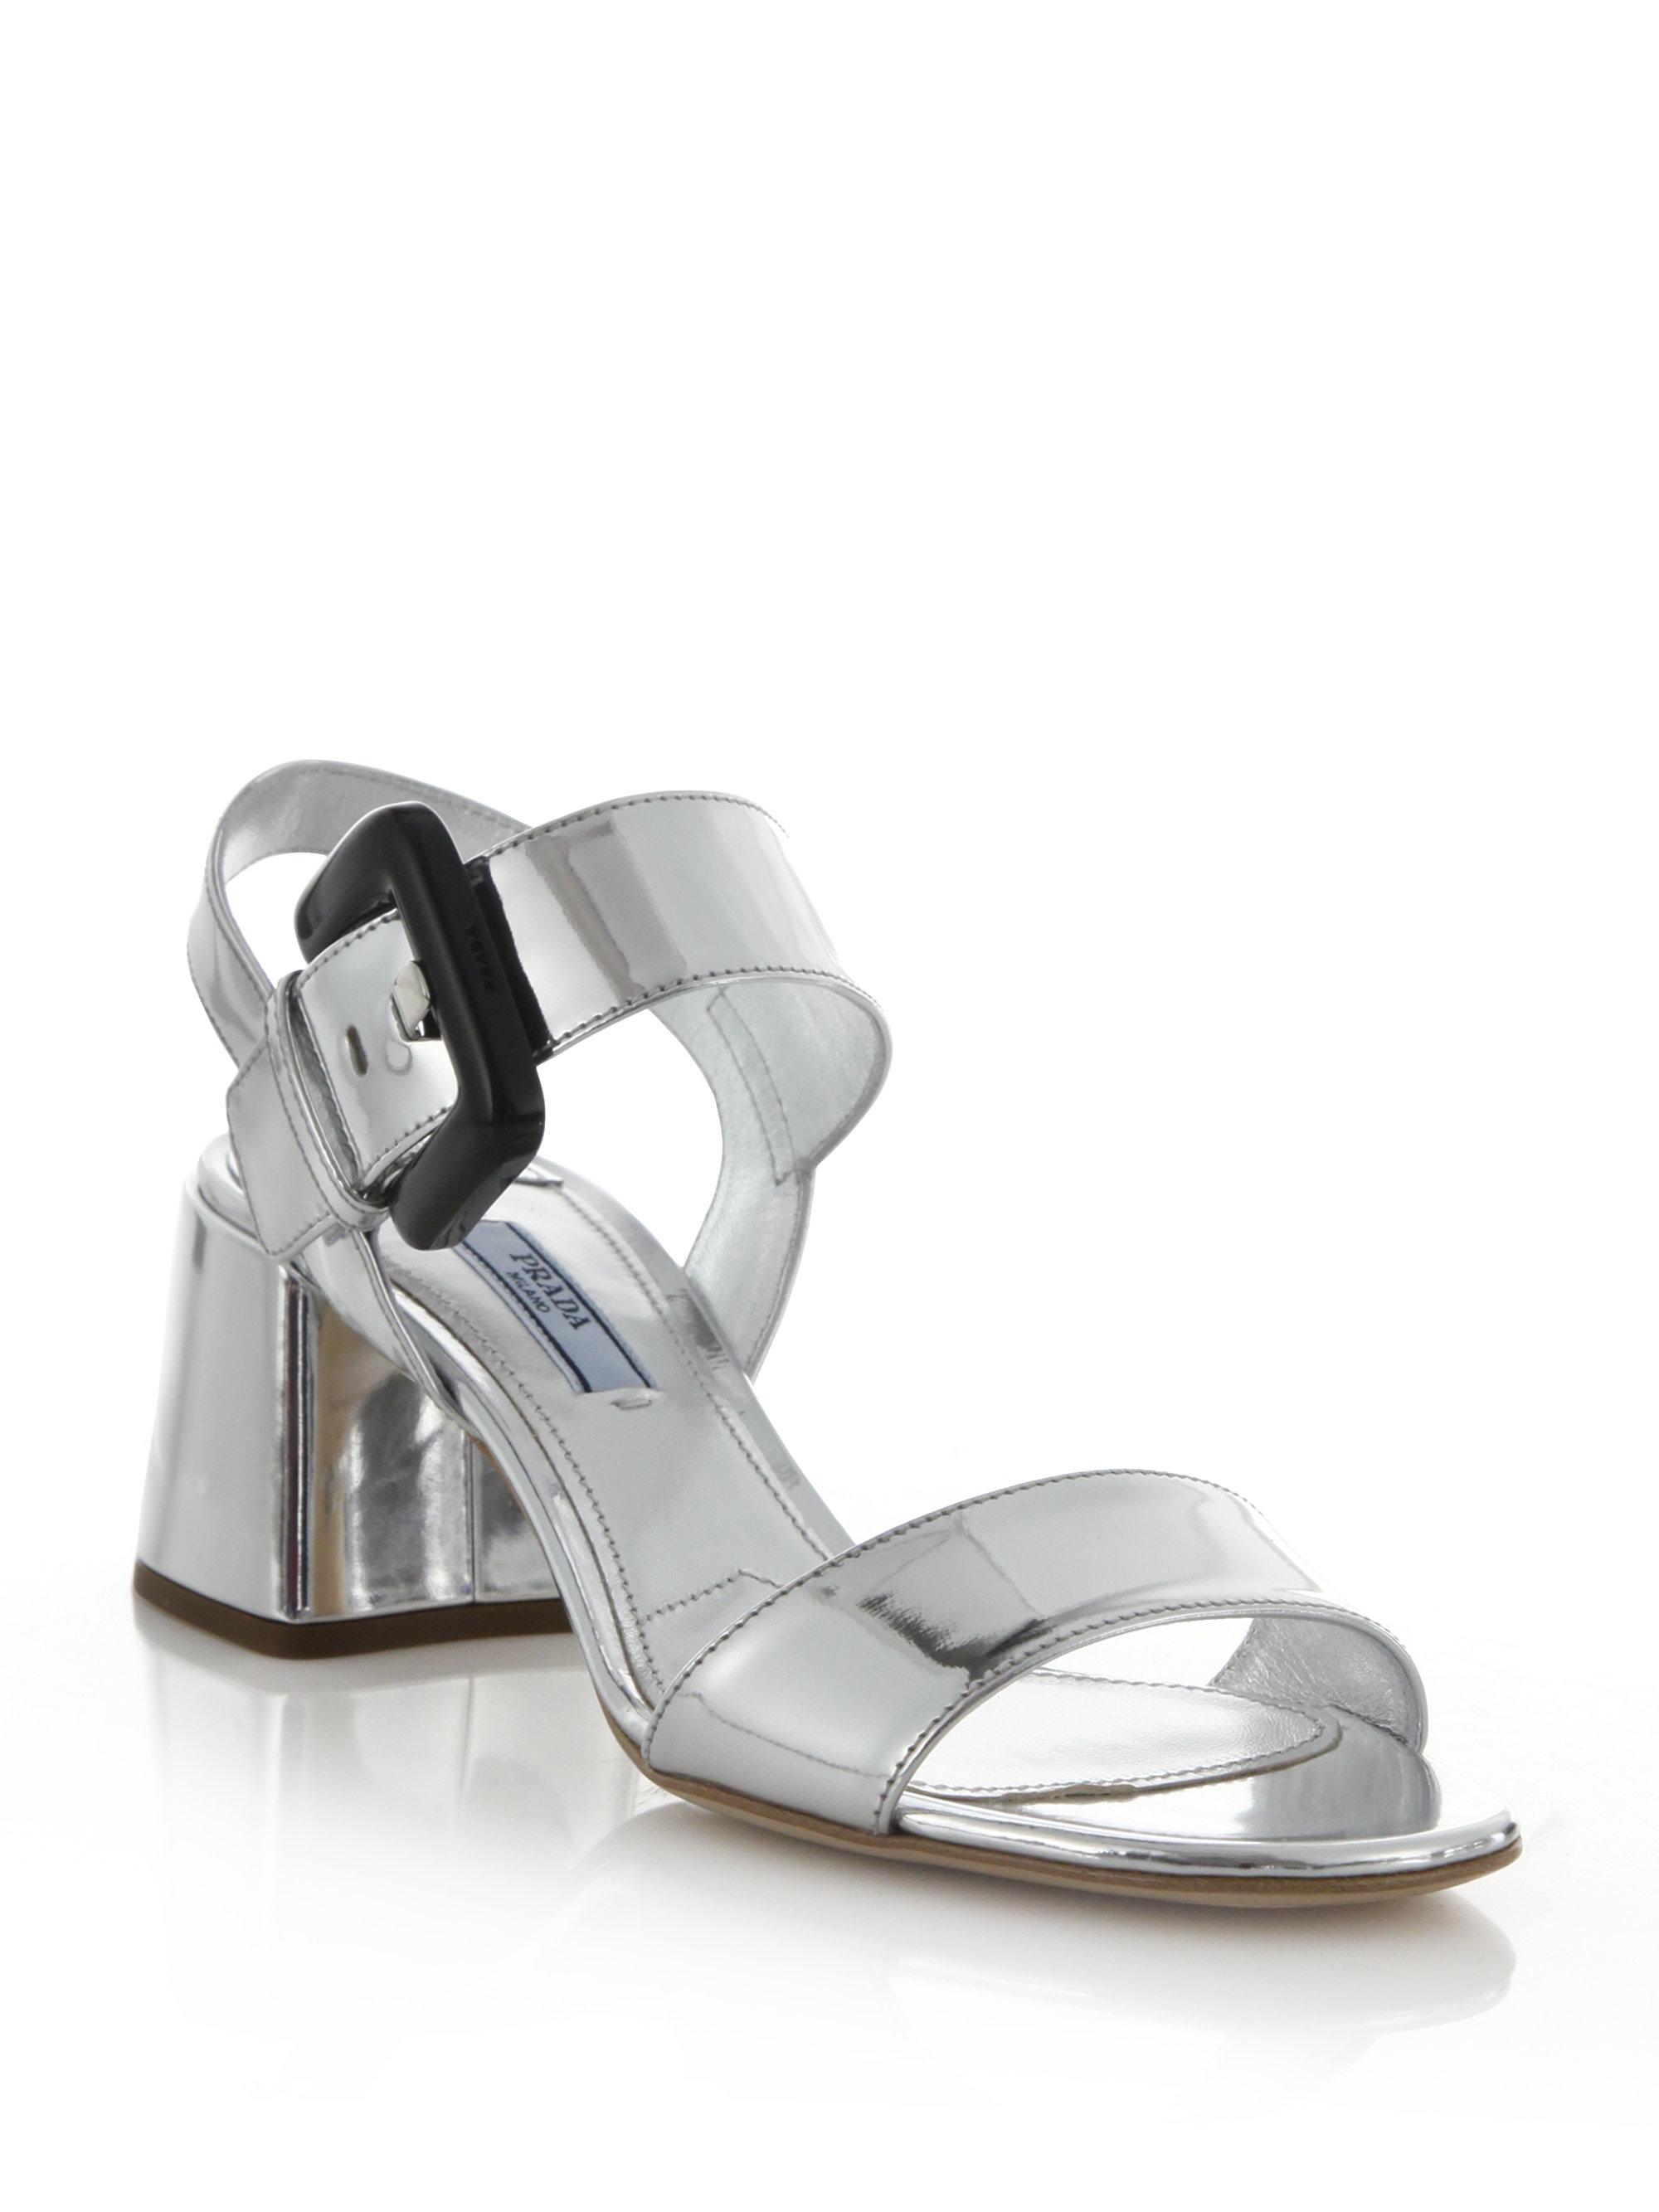 Prada Metallic Patent Leather Sandals outlet wholesale price HoA7b5wFUJ